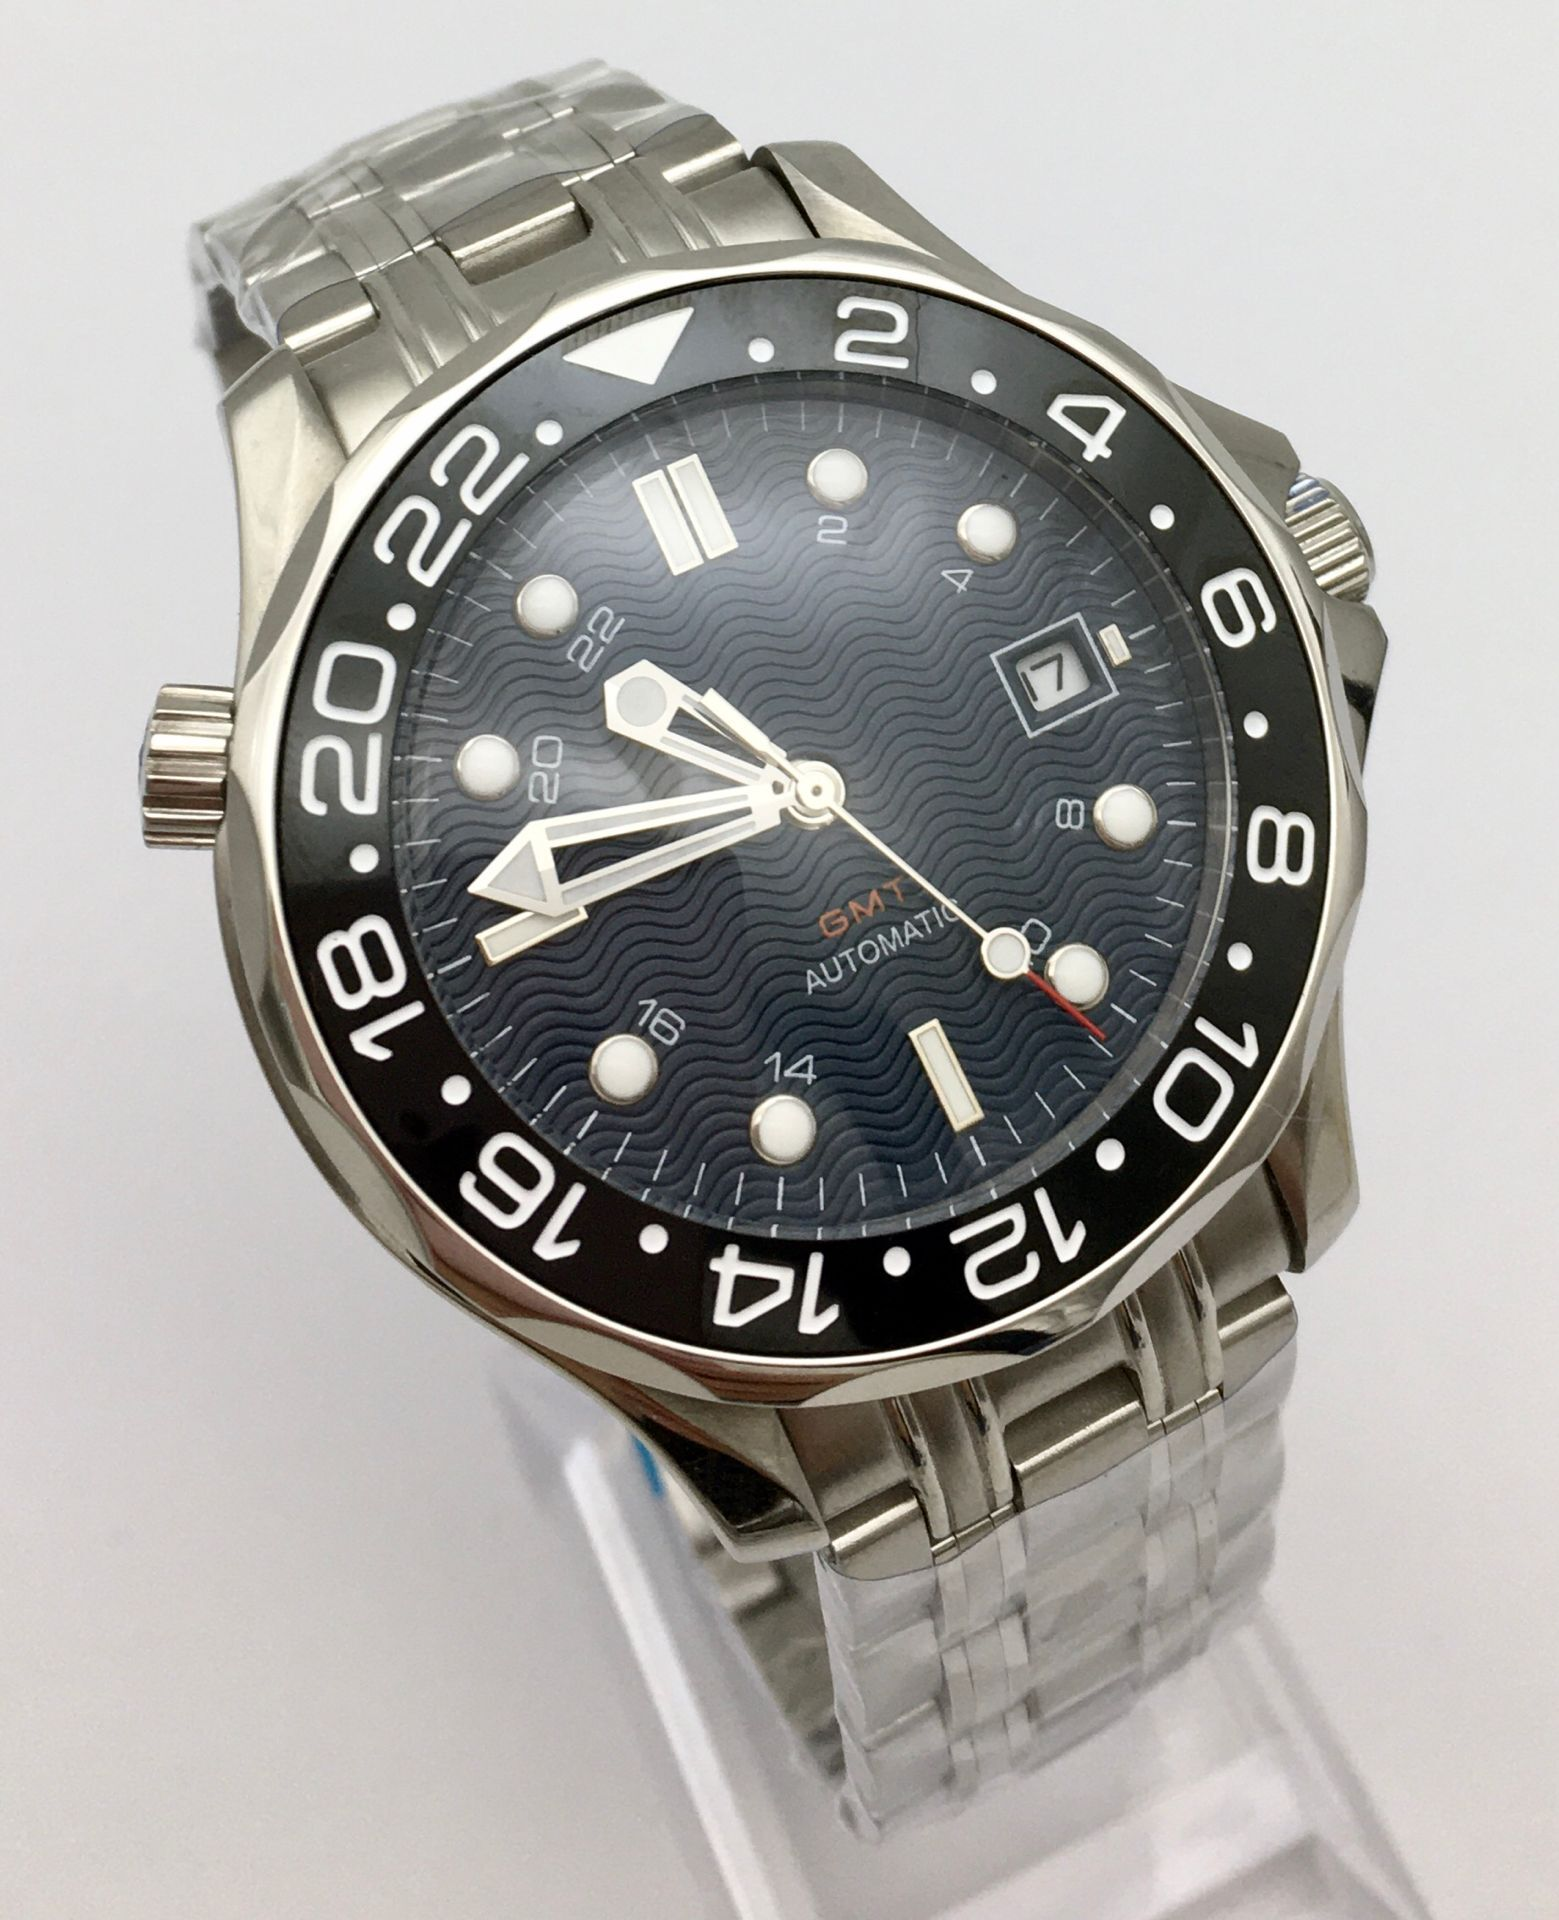 41cm Blue Wave Dial Mechanical Men's Watch Automatic Watch Men's Clock Date Ceramic Bezel Stainless Steel Solid Case enlarge